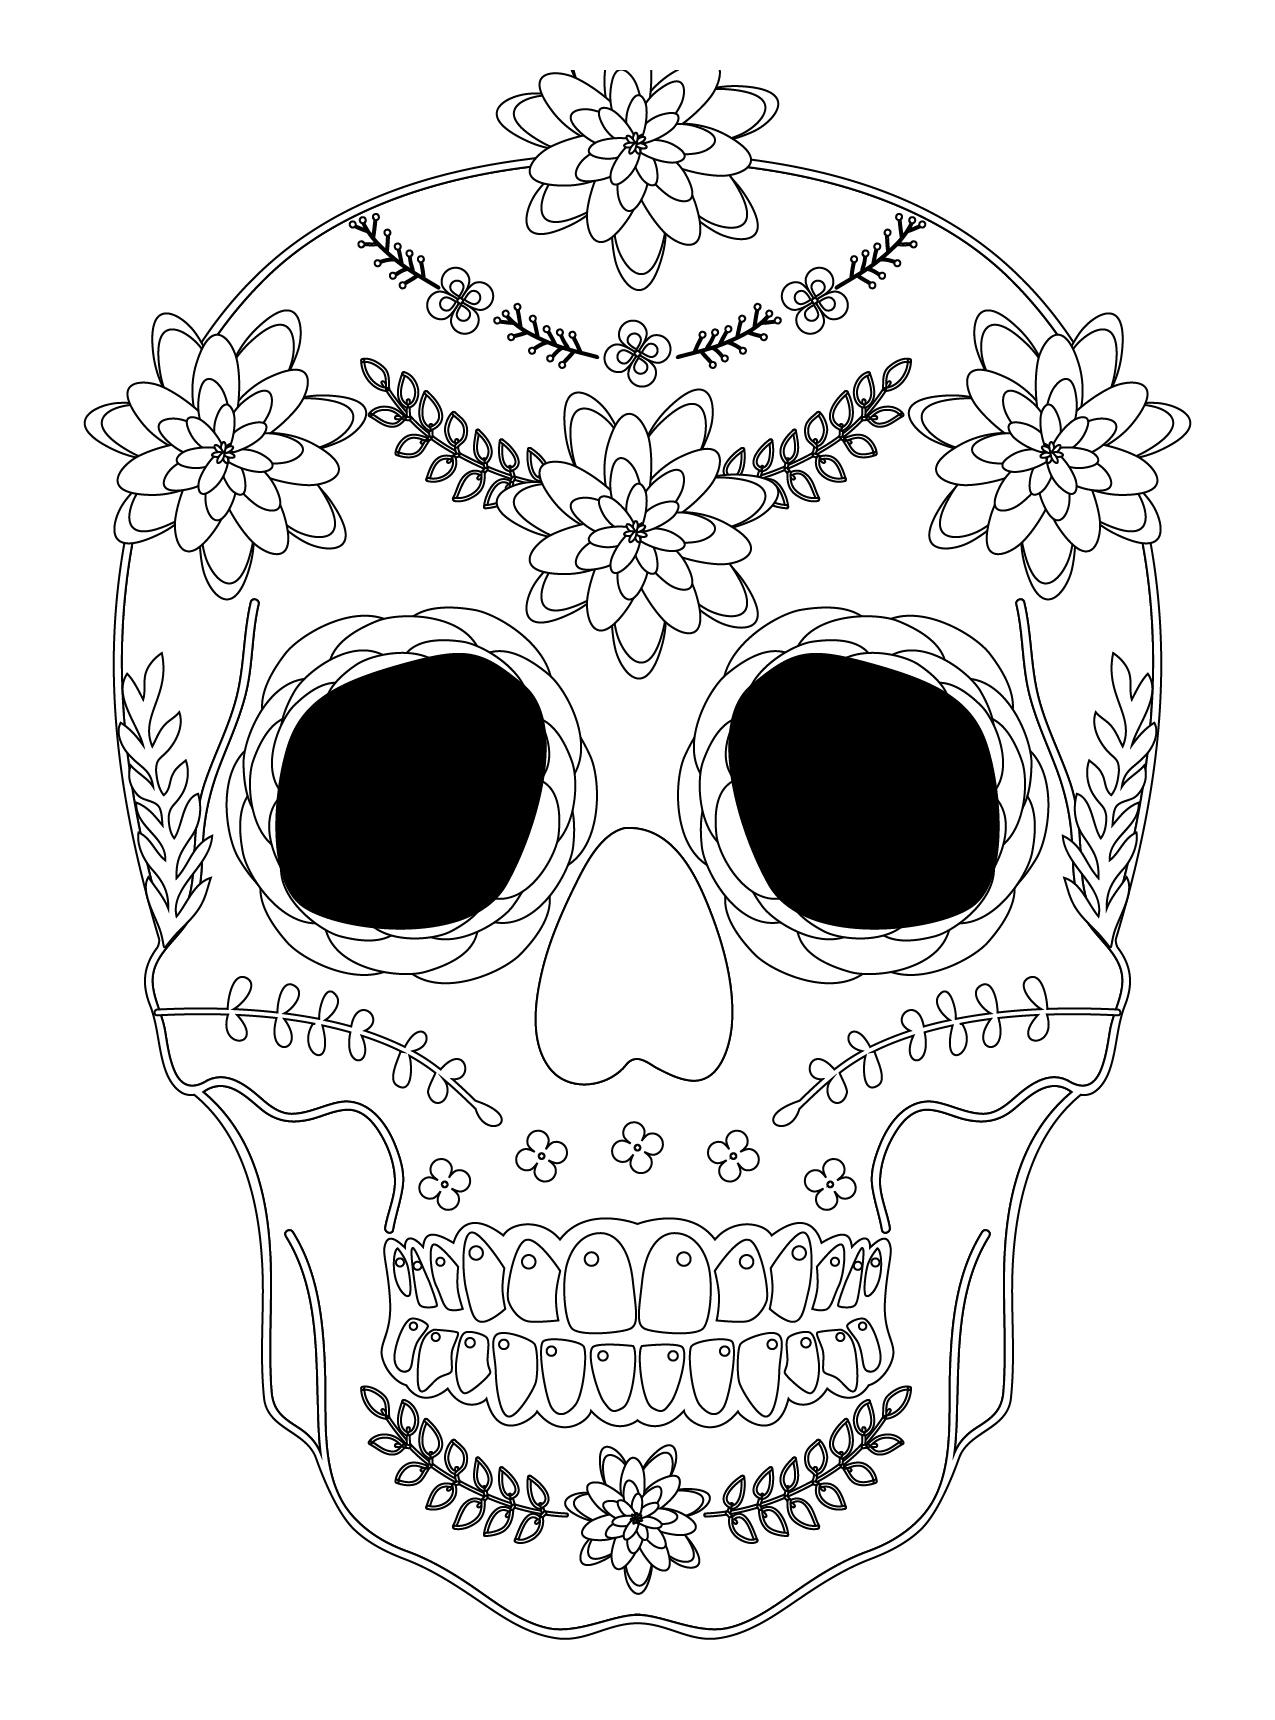 Dessin D'halloween Qui Fait Peur : dessin, d'halloween, Artherapie.ca